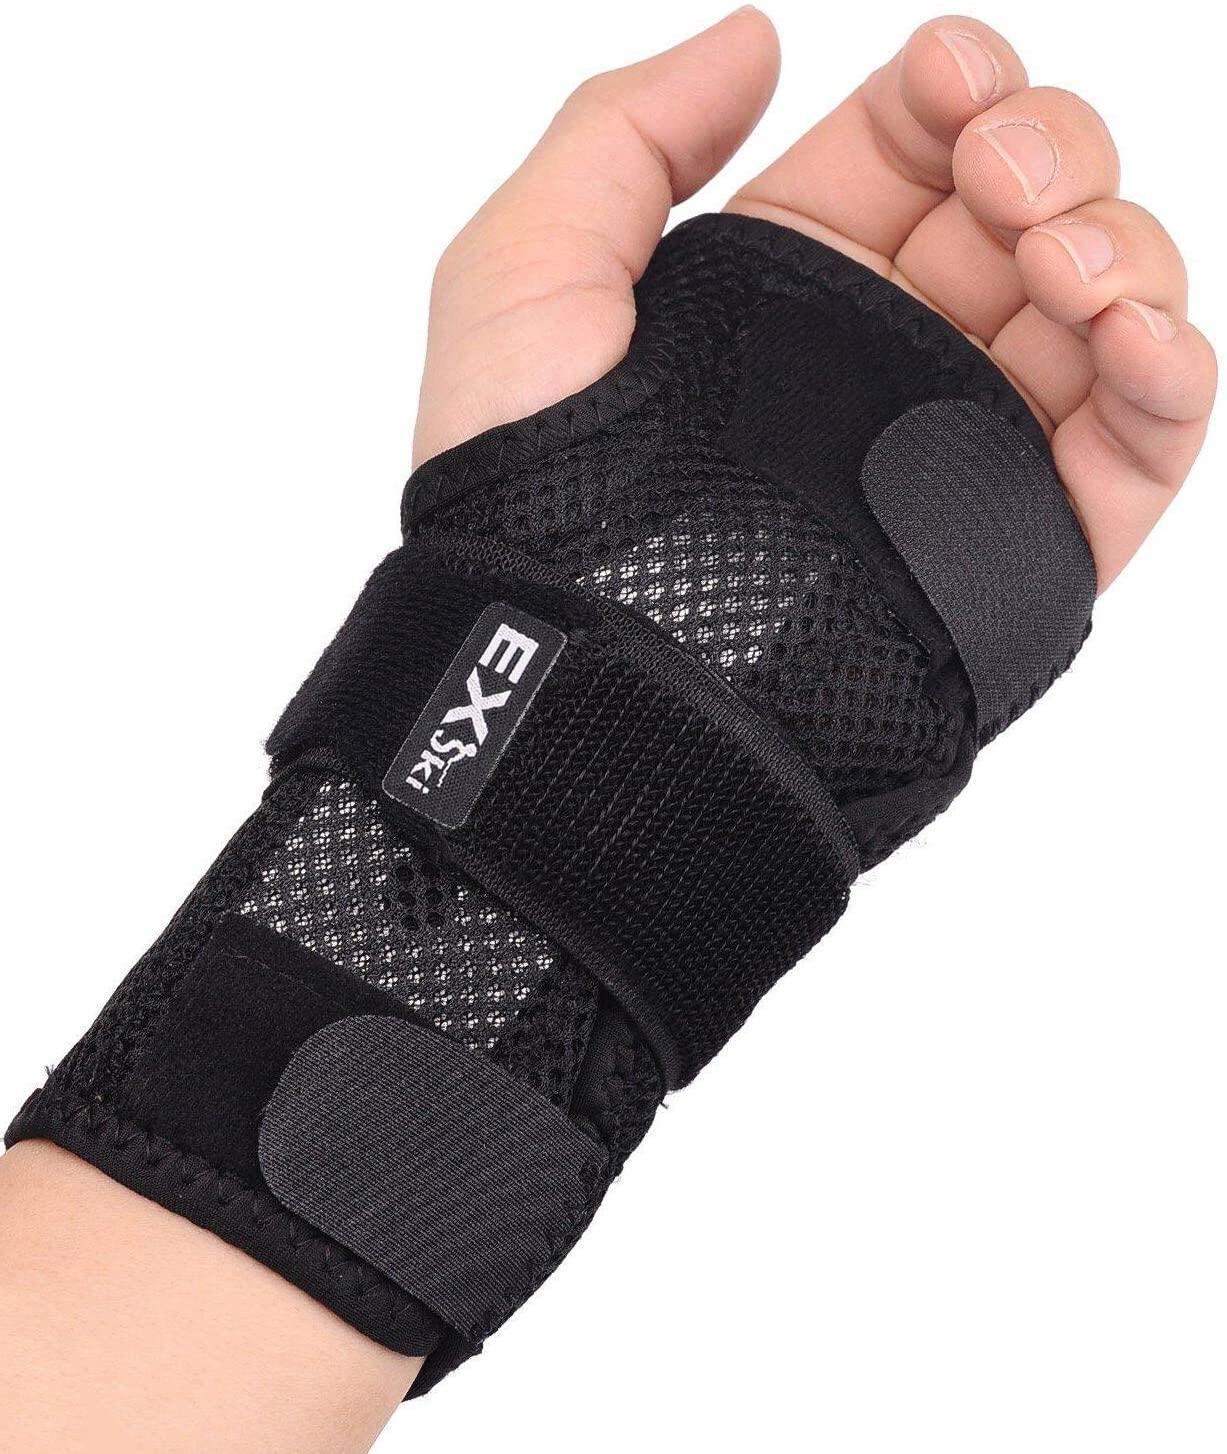 EXski Wrist Brace for Carpal Tunnel, Night Sleep Wrist Support Brace With Removable Metal Splints Left Hand Large